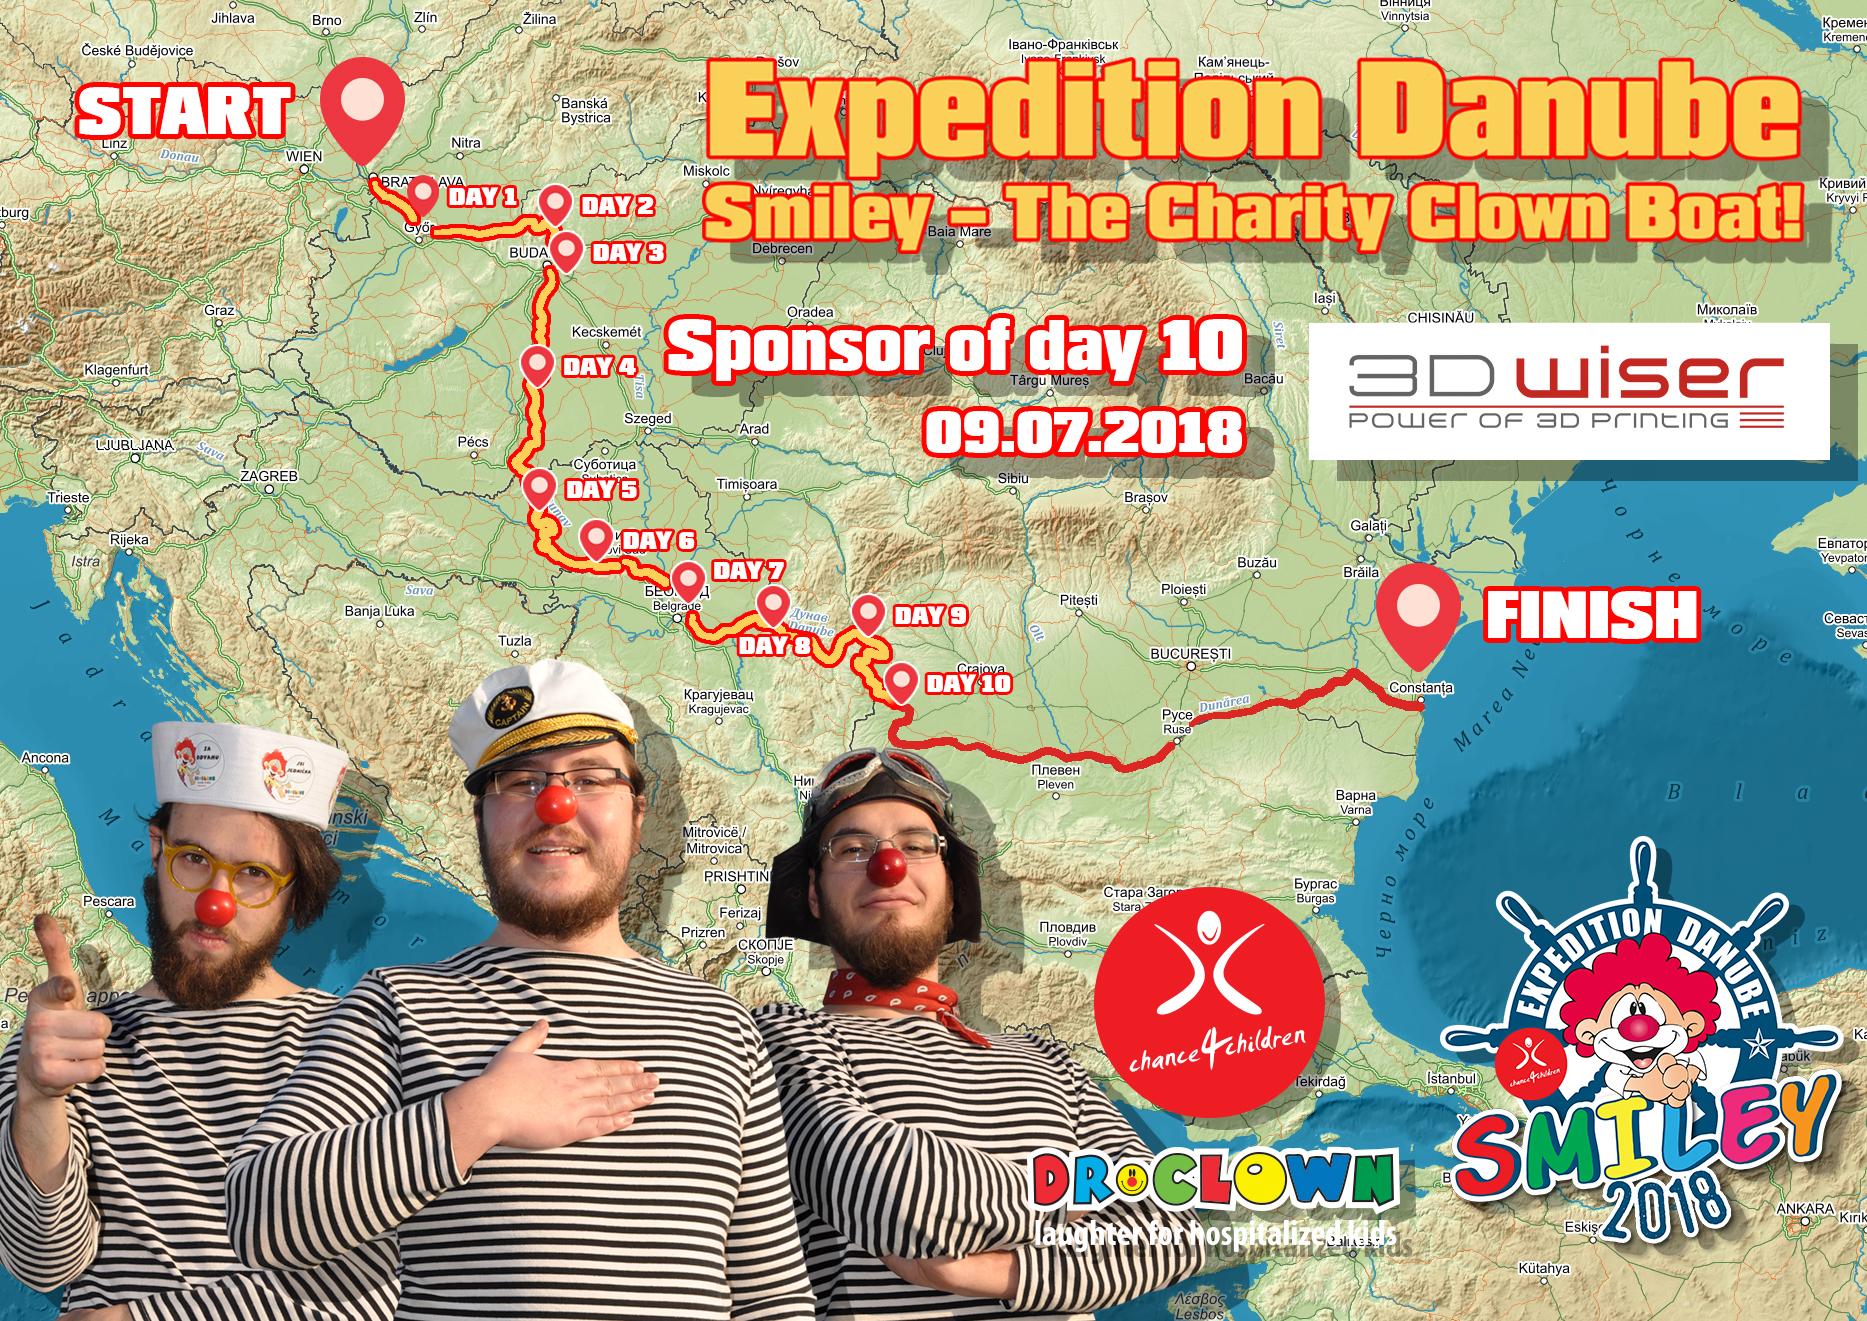 Expedition-Danube-day-10-3D.jpg-QbphRBJV3STuguhPcRxnnqJT.jpg